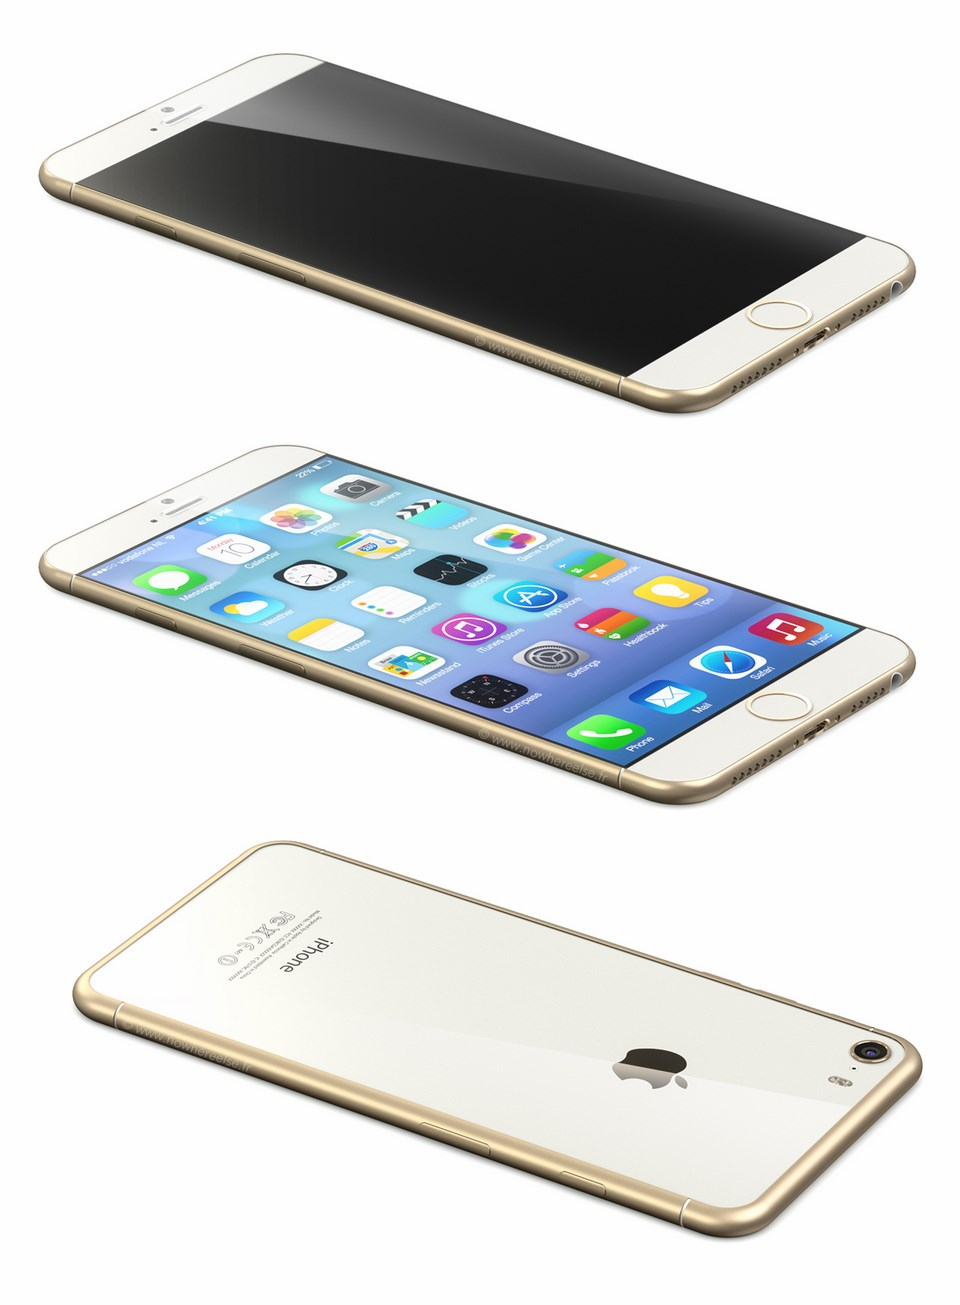 iPhone 6 Mockup Gold